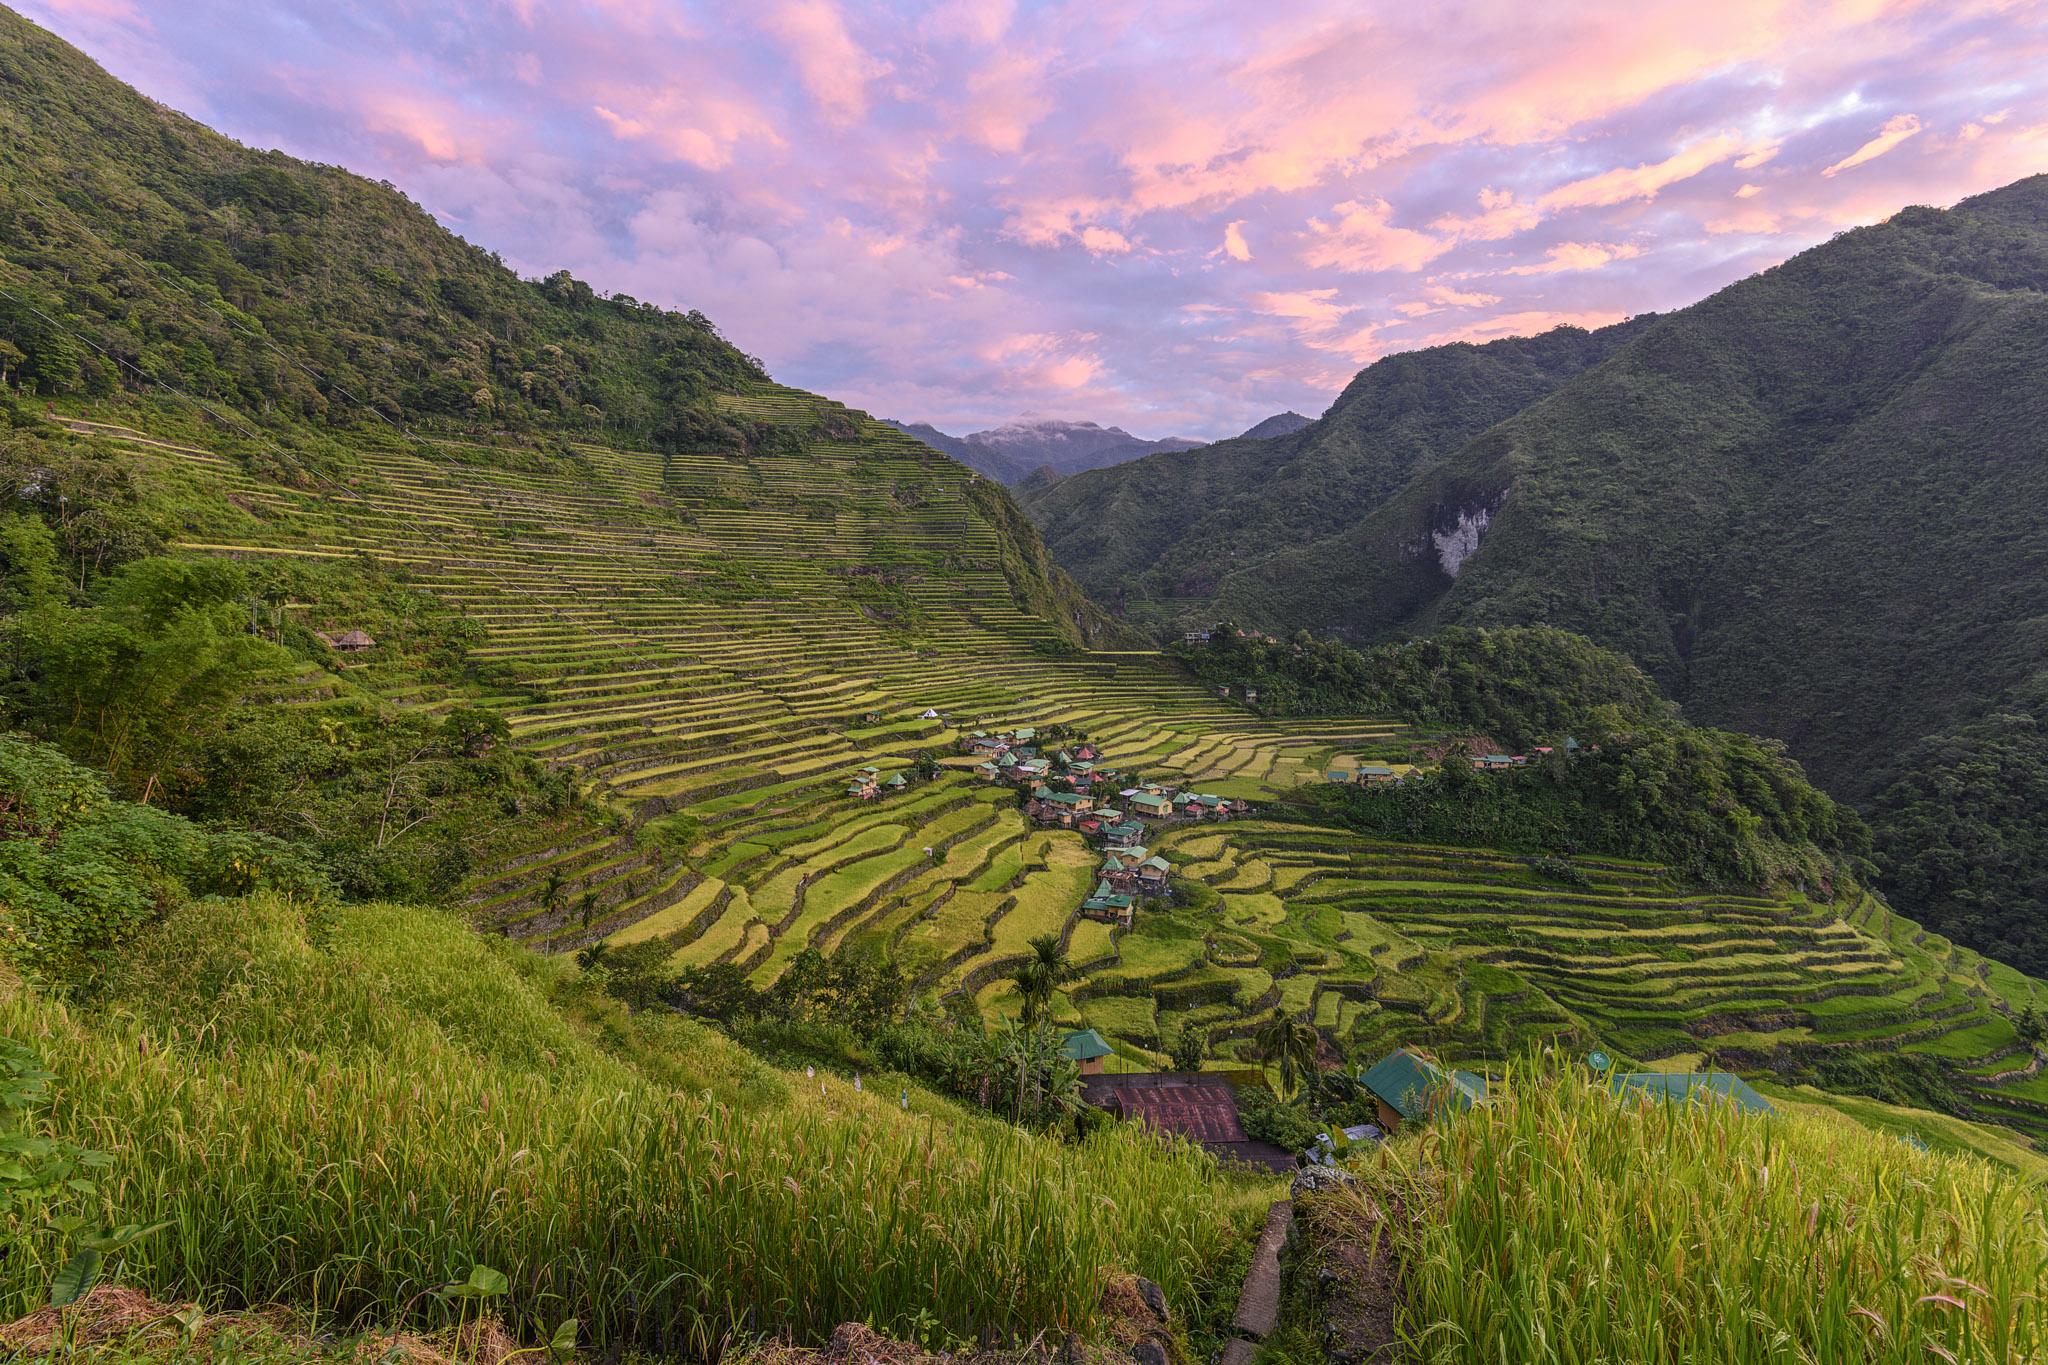 20190531_Nikon_Cordilleras_Dk1_00152-Edit.jpg